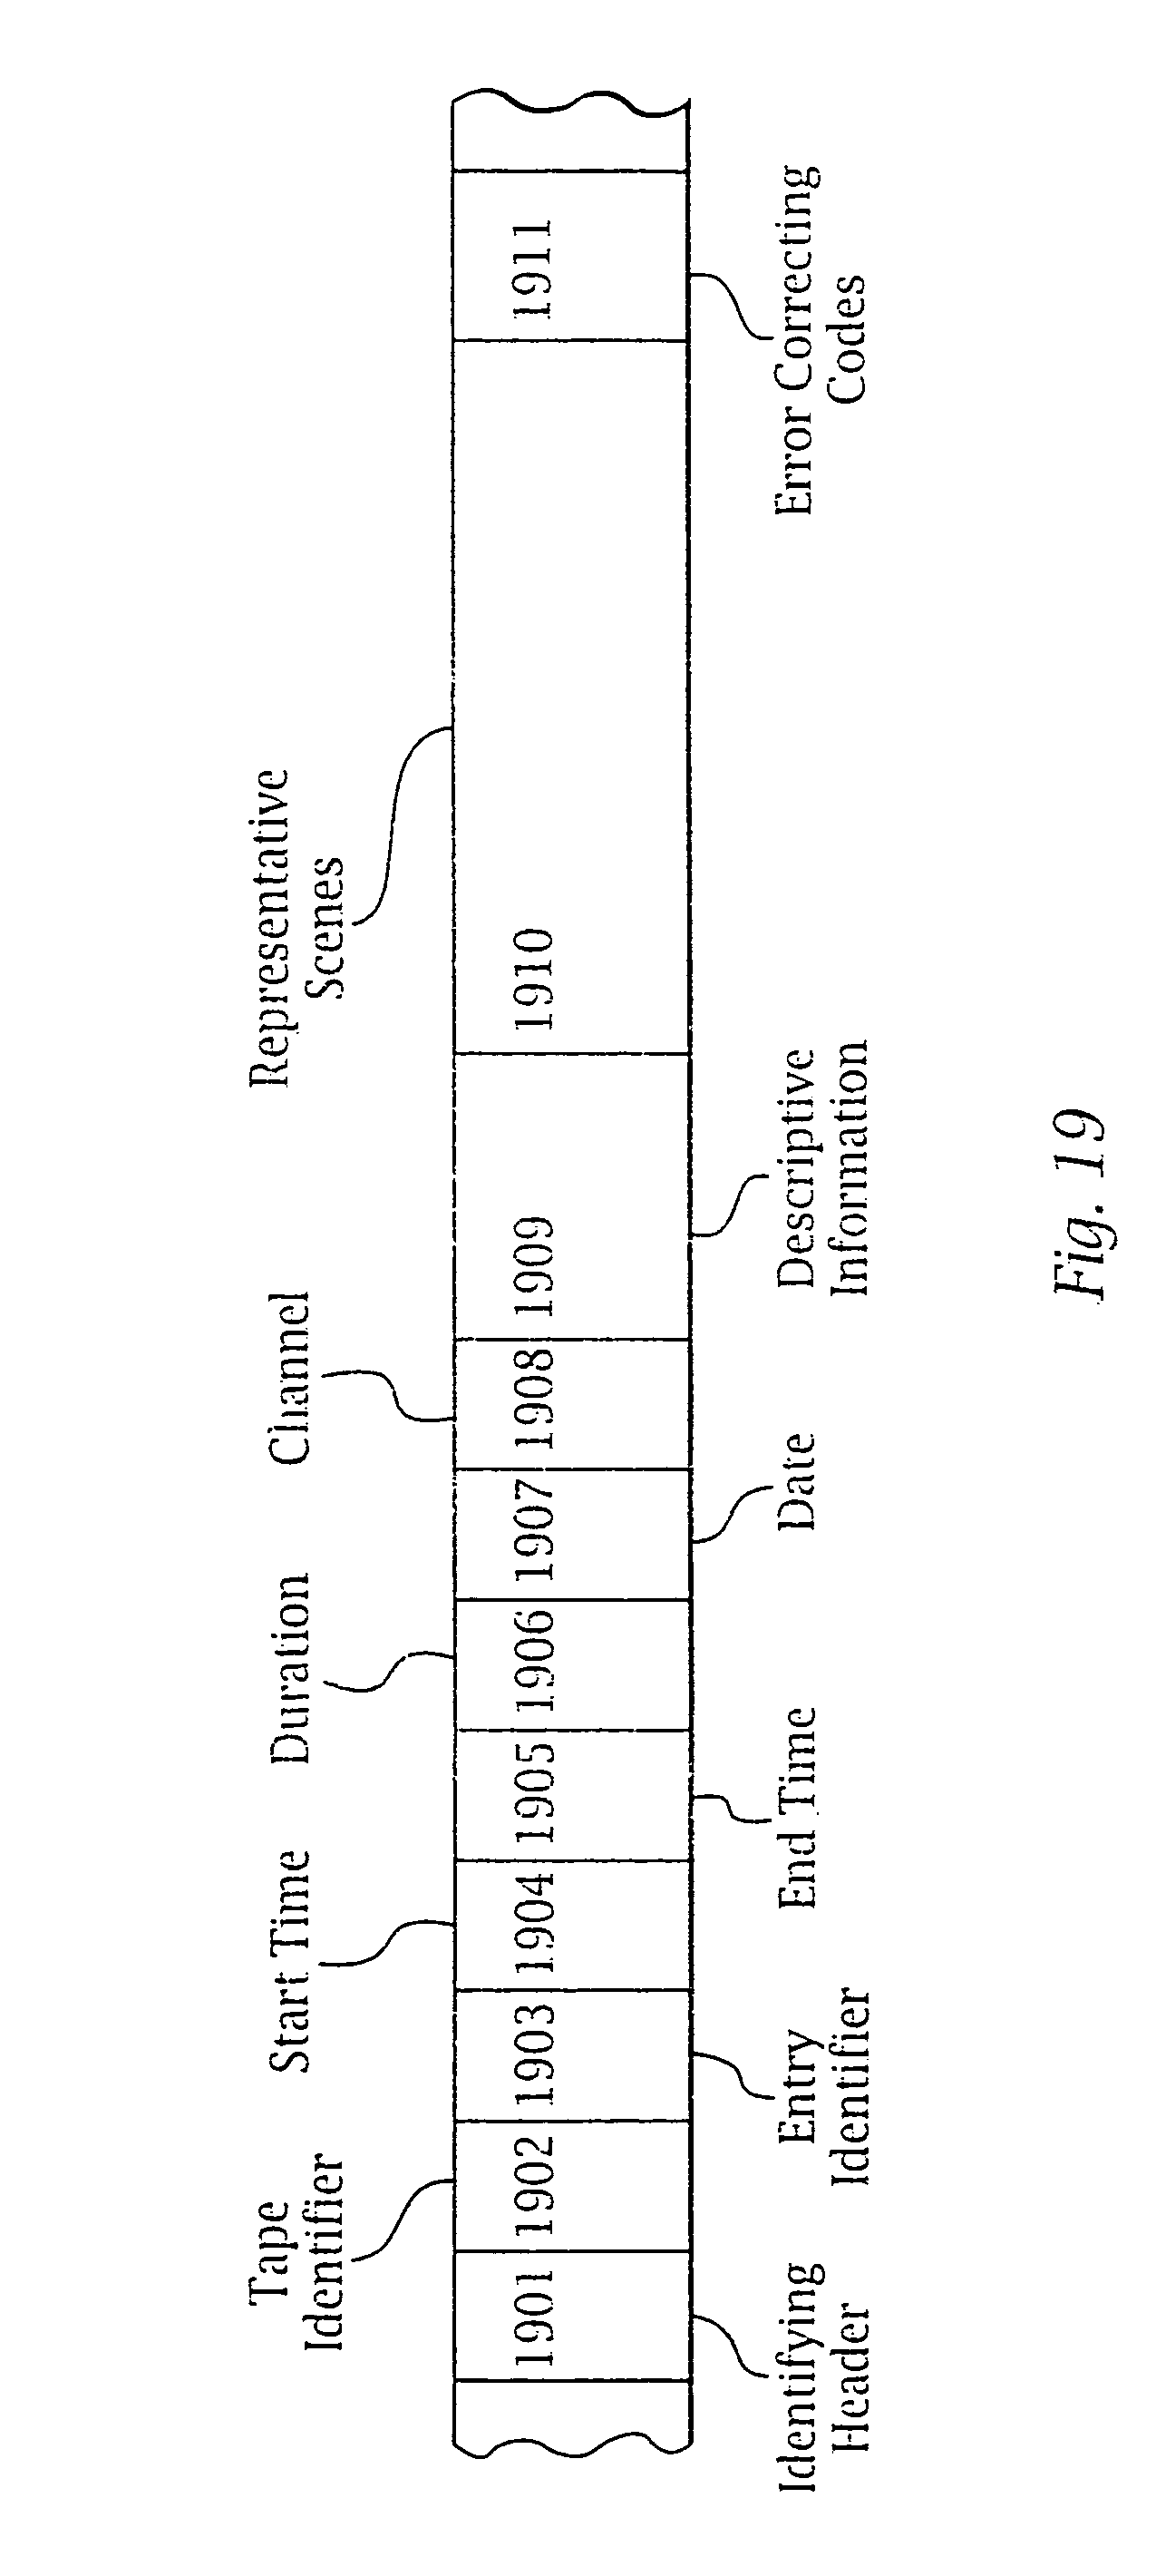 Patent US 7,006,881 B1